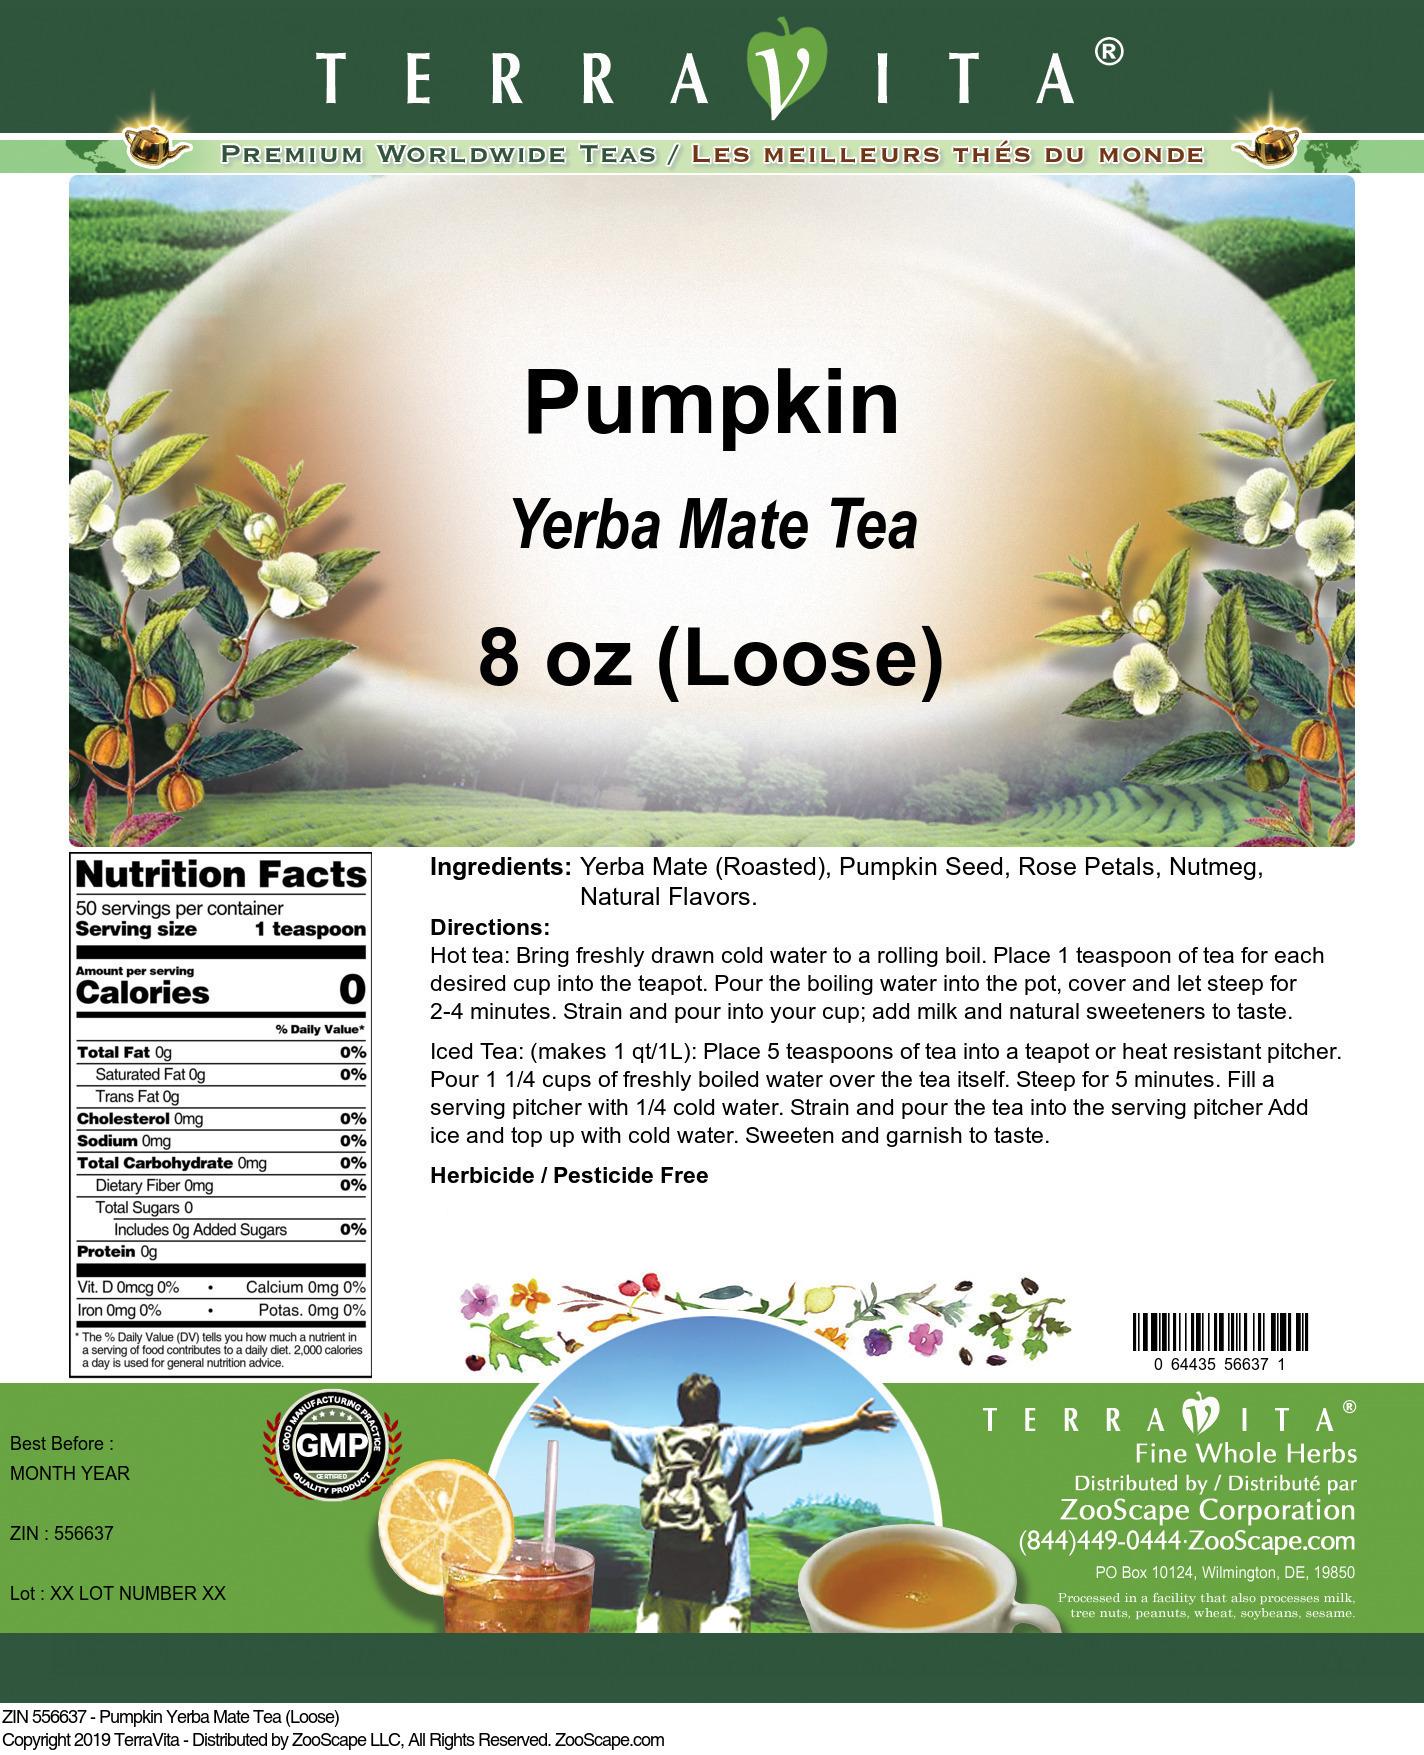 Pumpkin Yerba Mate Tea (Loose)